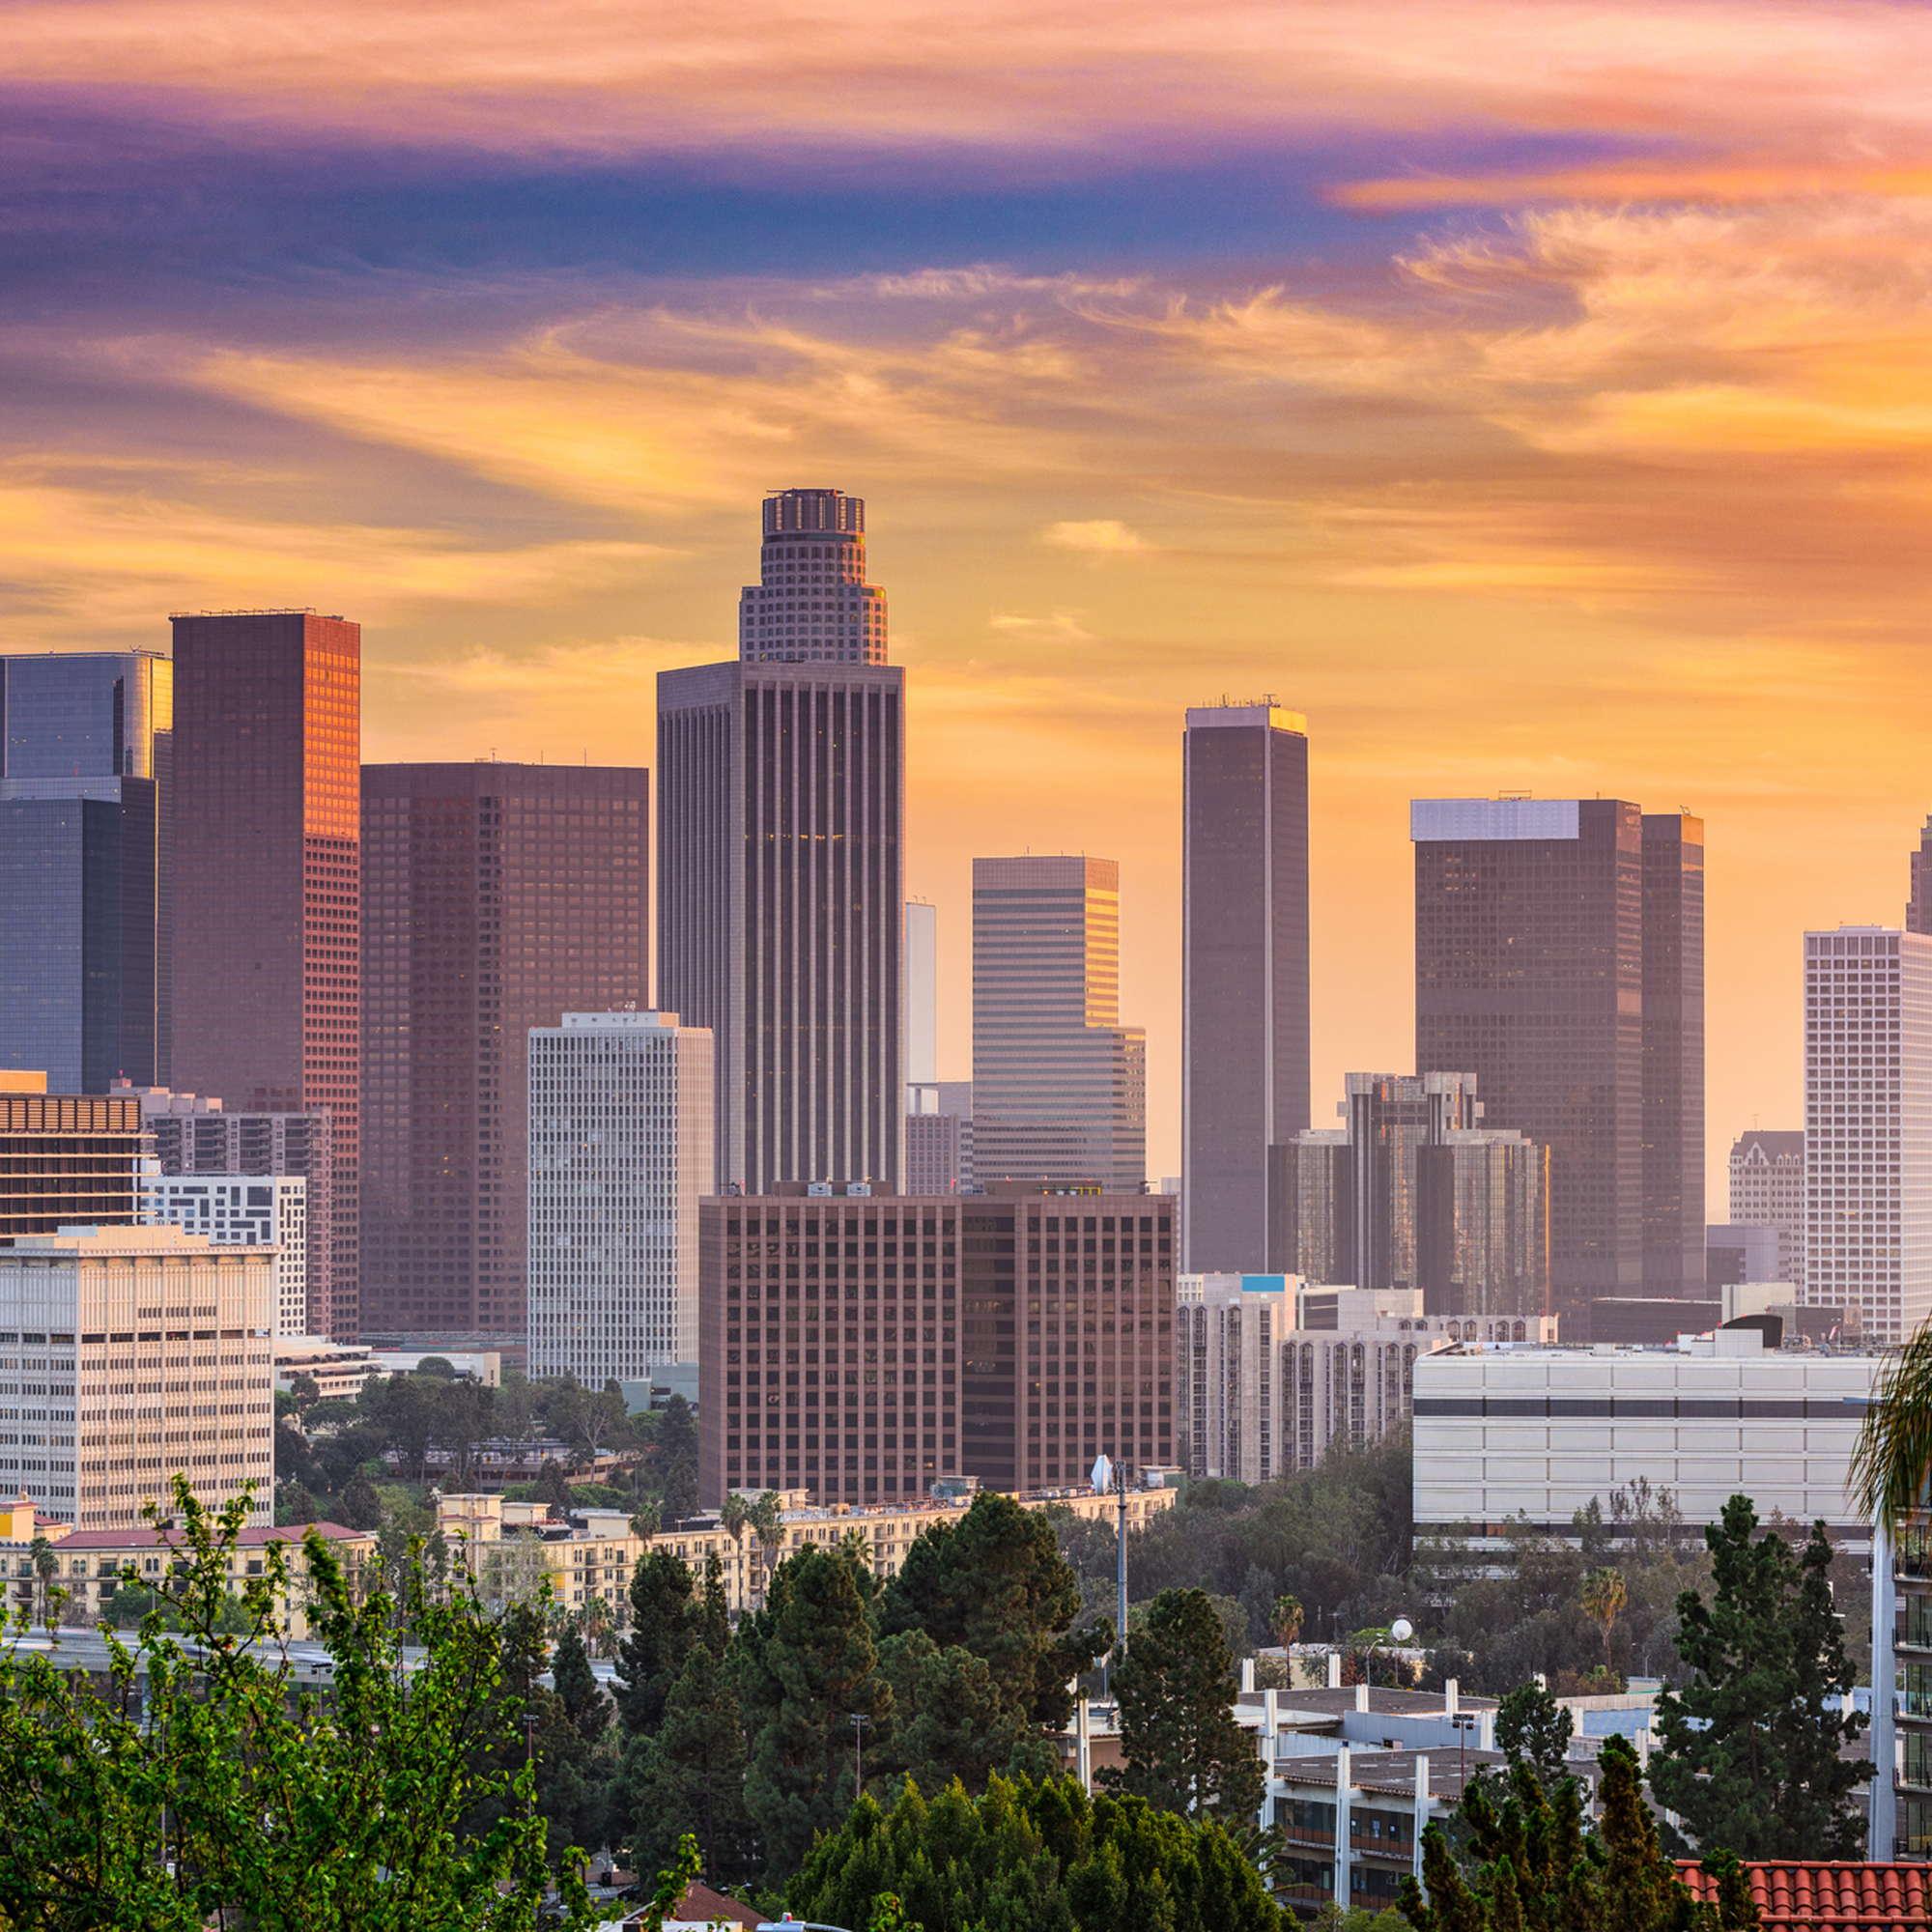 Hisaya Los Angeles: Hotels In Los Angeles, California